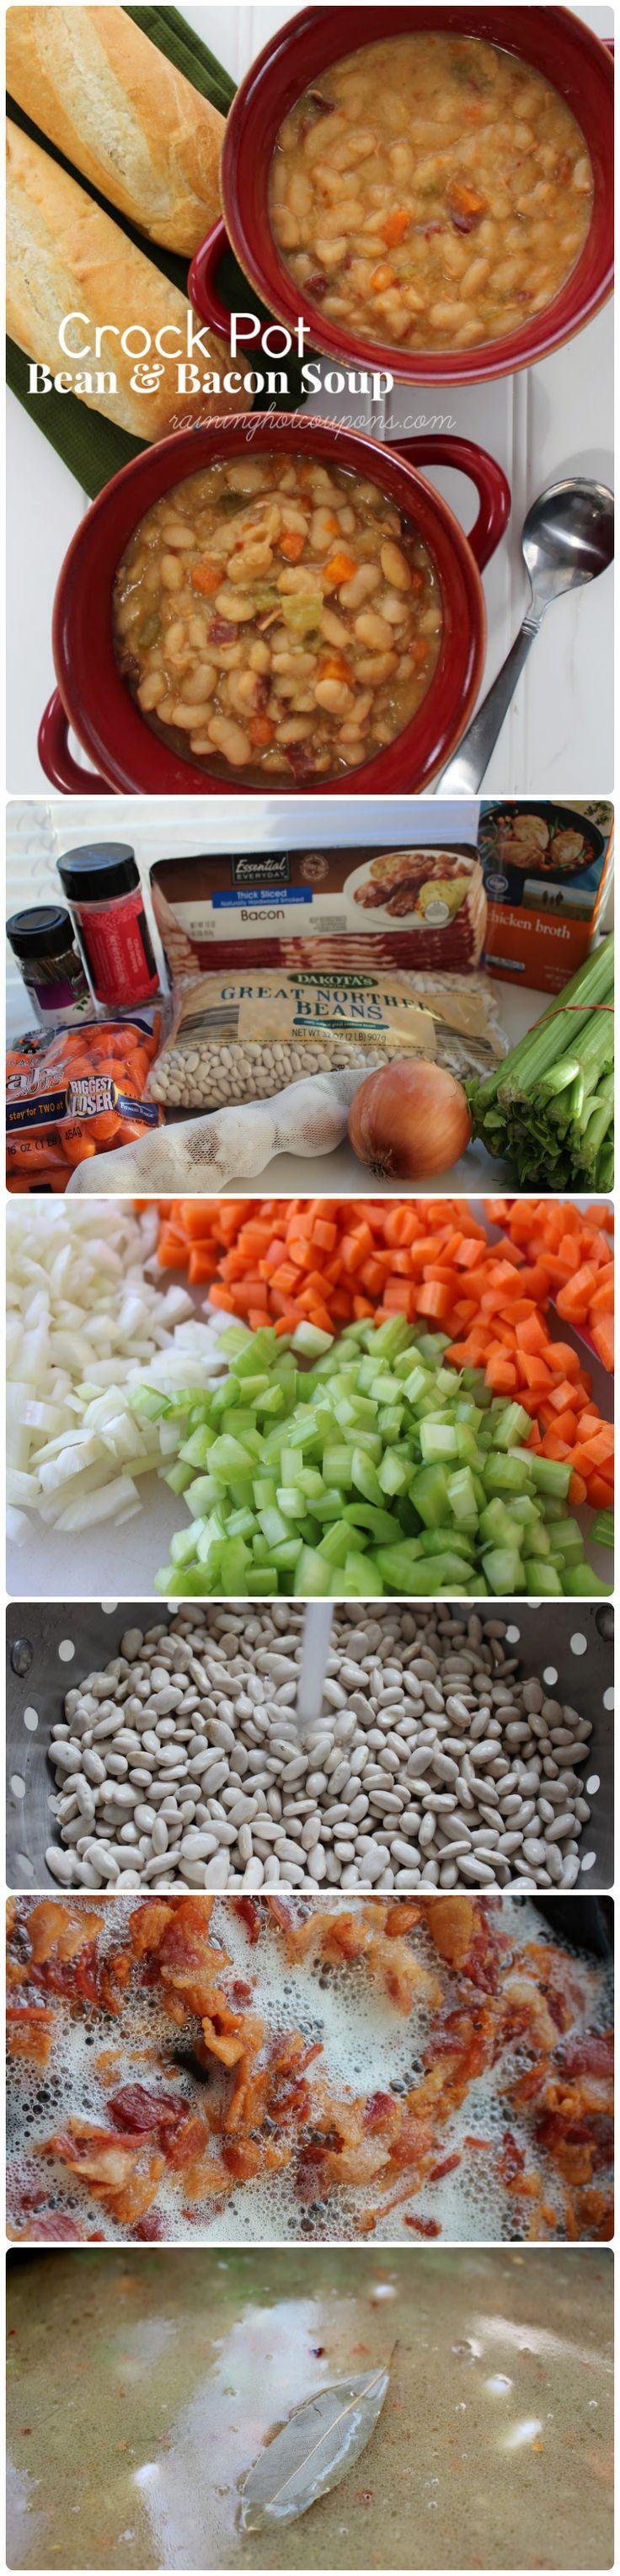 Crock Pot Bean & Bacon Soup